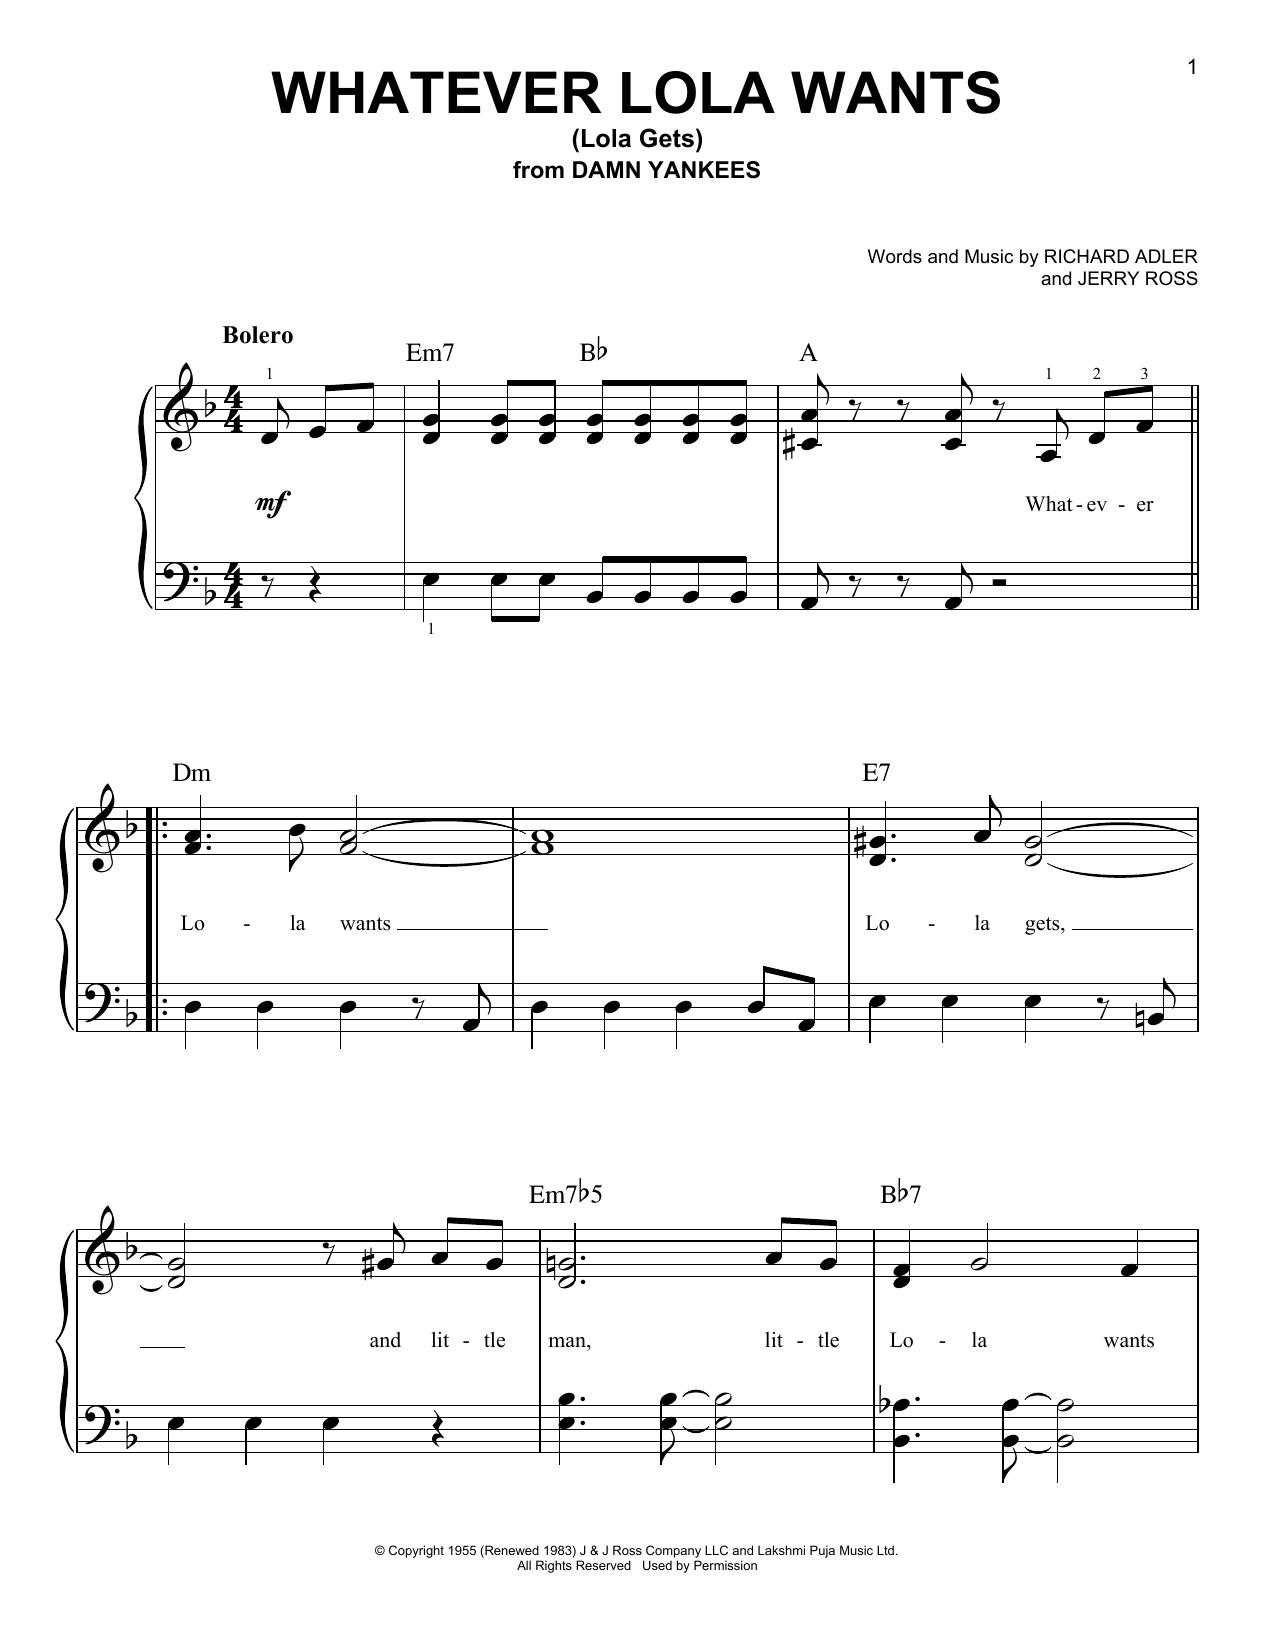 Whatever Lola Wants (Lola Gets) (Very Easy Piano)